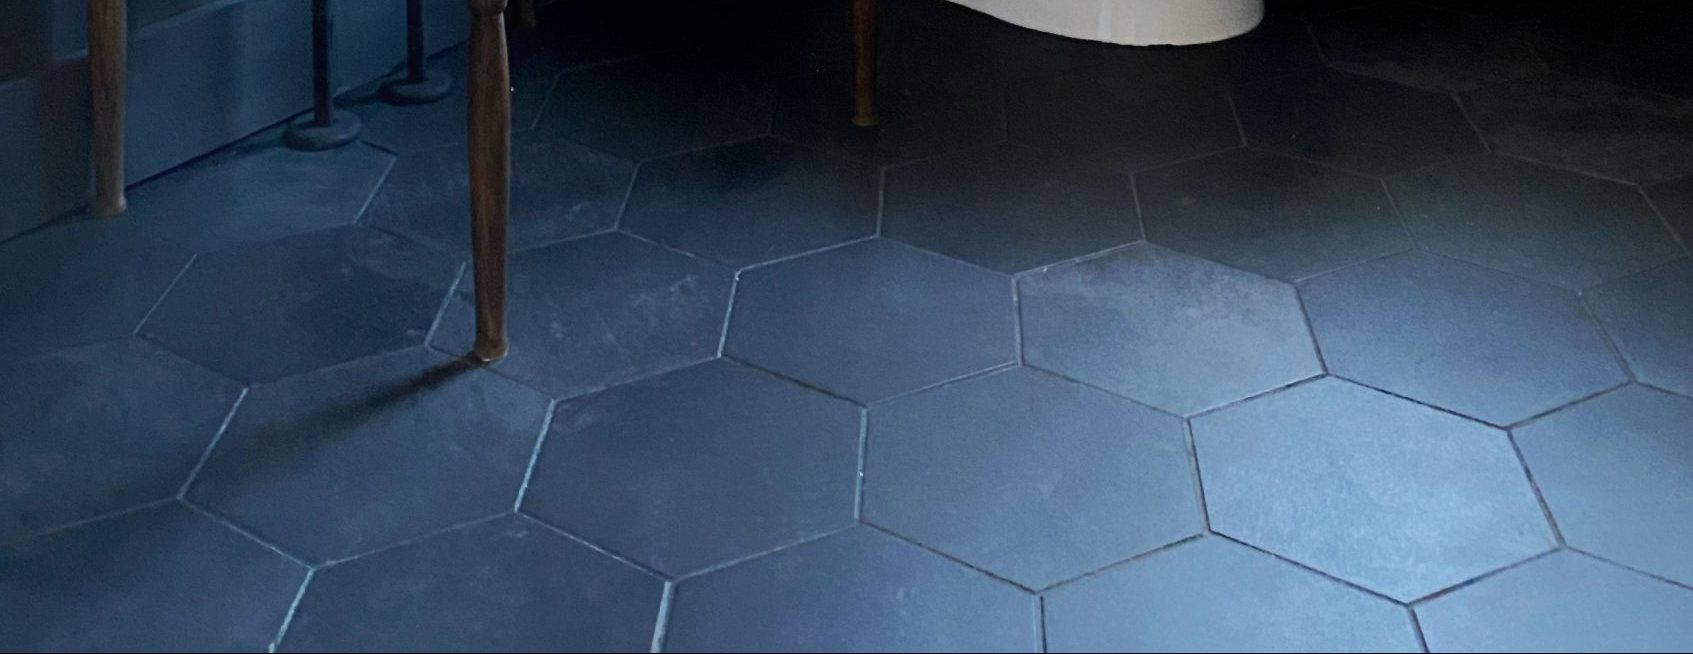 Bathroom progress:peel and stick groutable floors